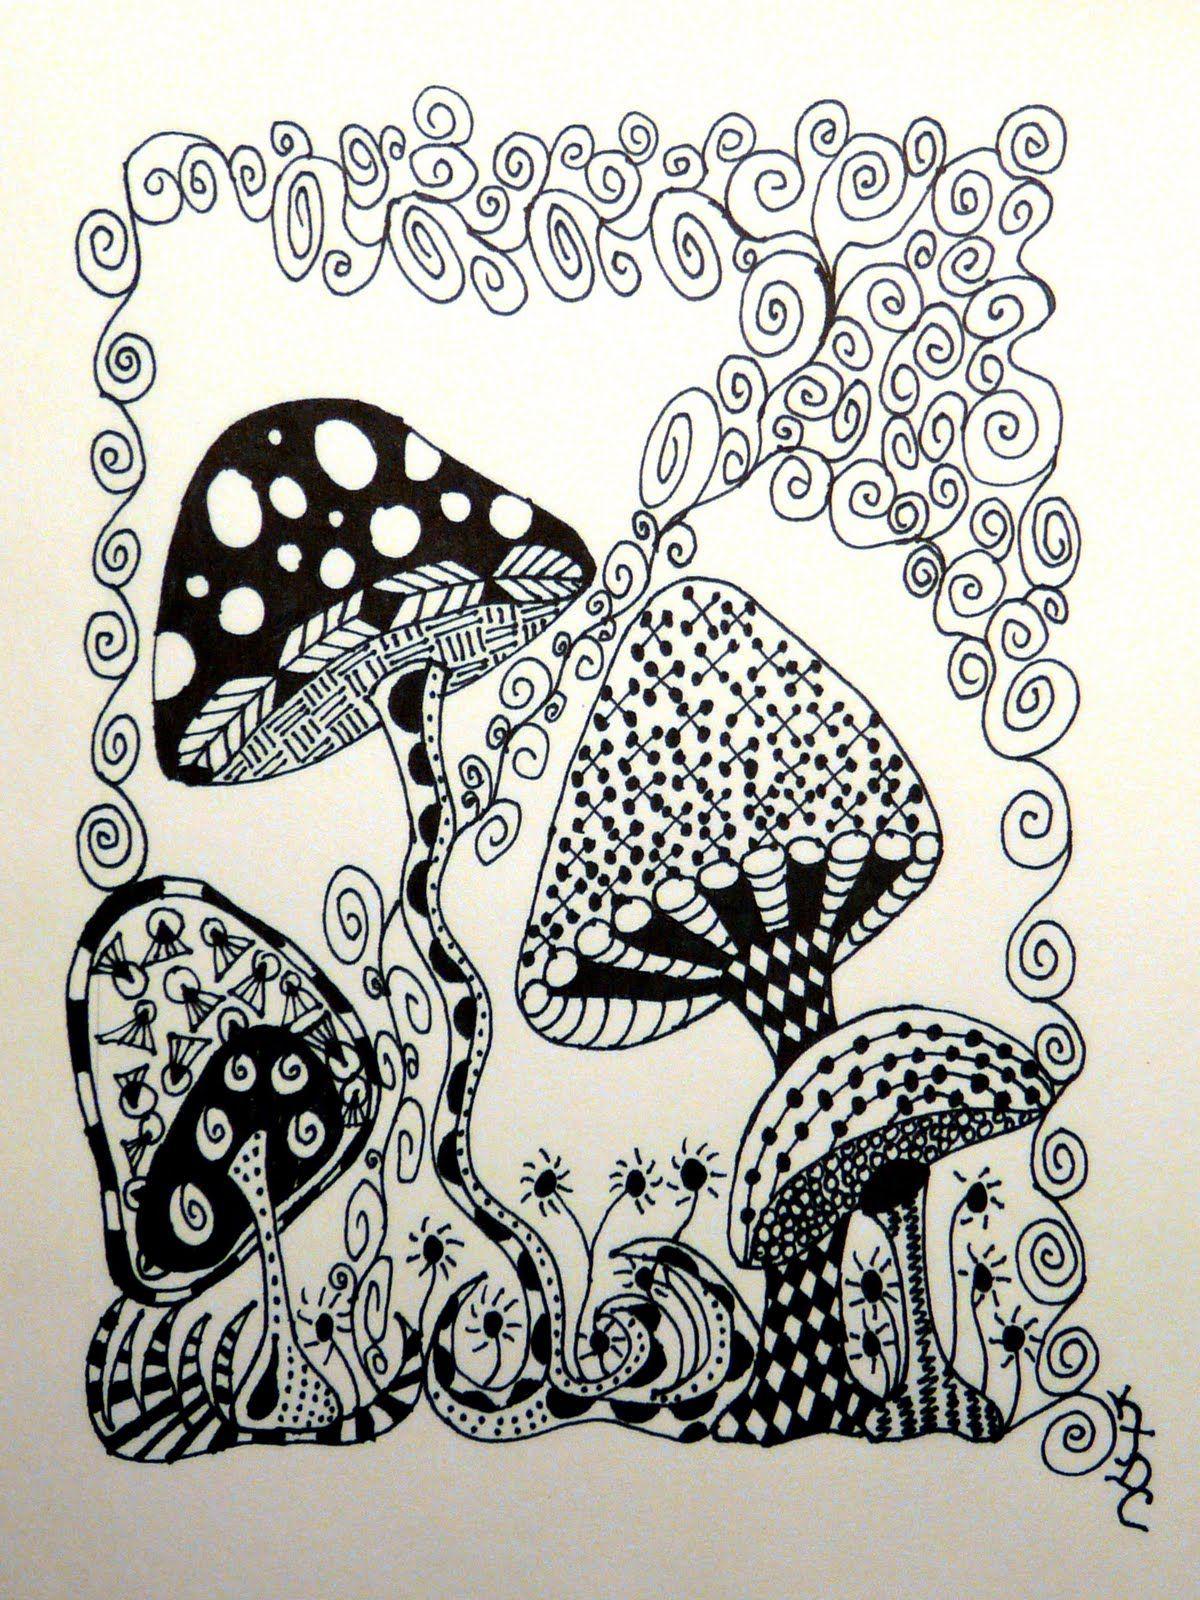 Zen doodle colour - Nice Mushrooms Abstract Doodle Zentangle Zendoodle Paisley Coloring Pages Colouring Adult Detailed Advanced Printable Kleuren Voor